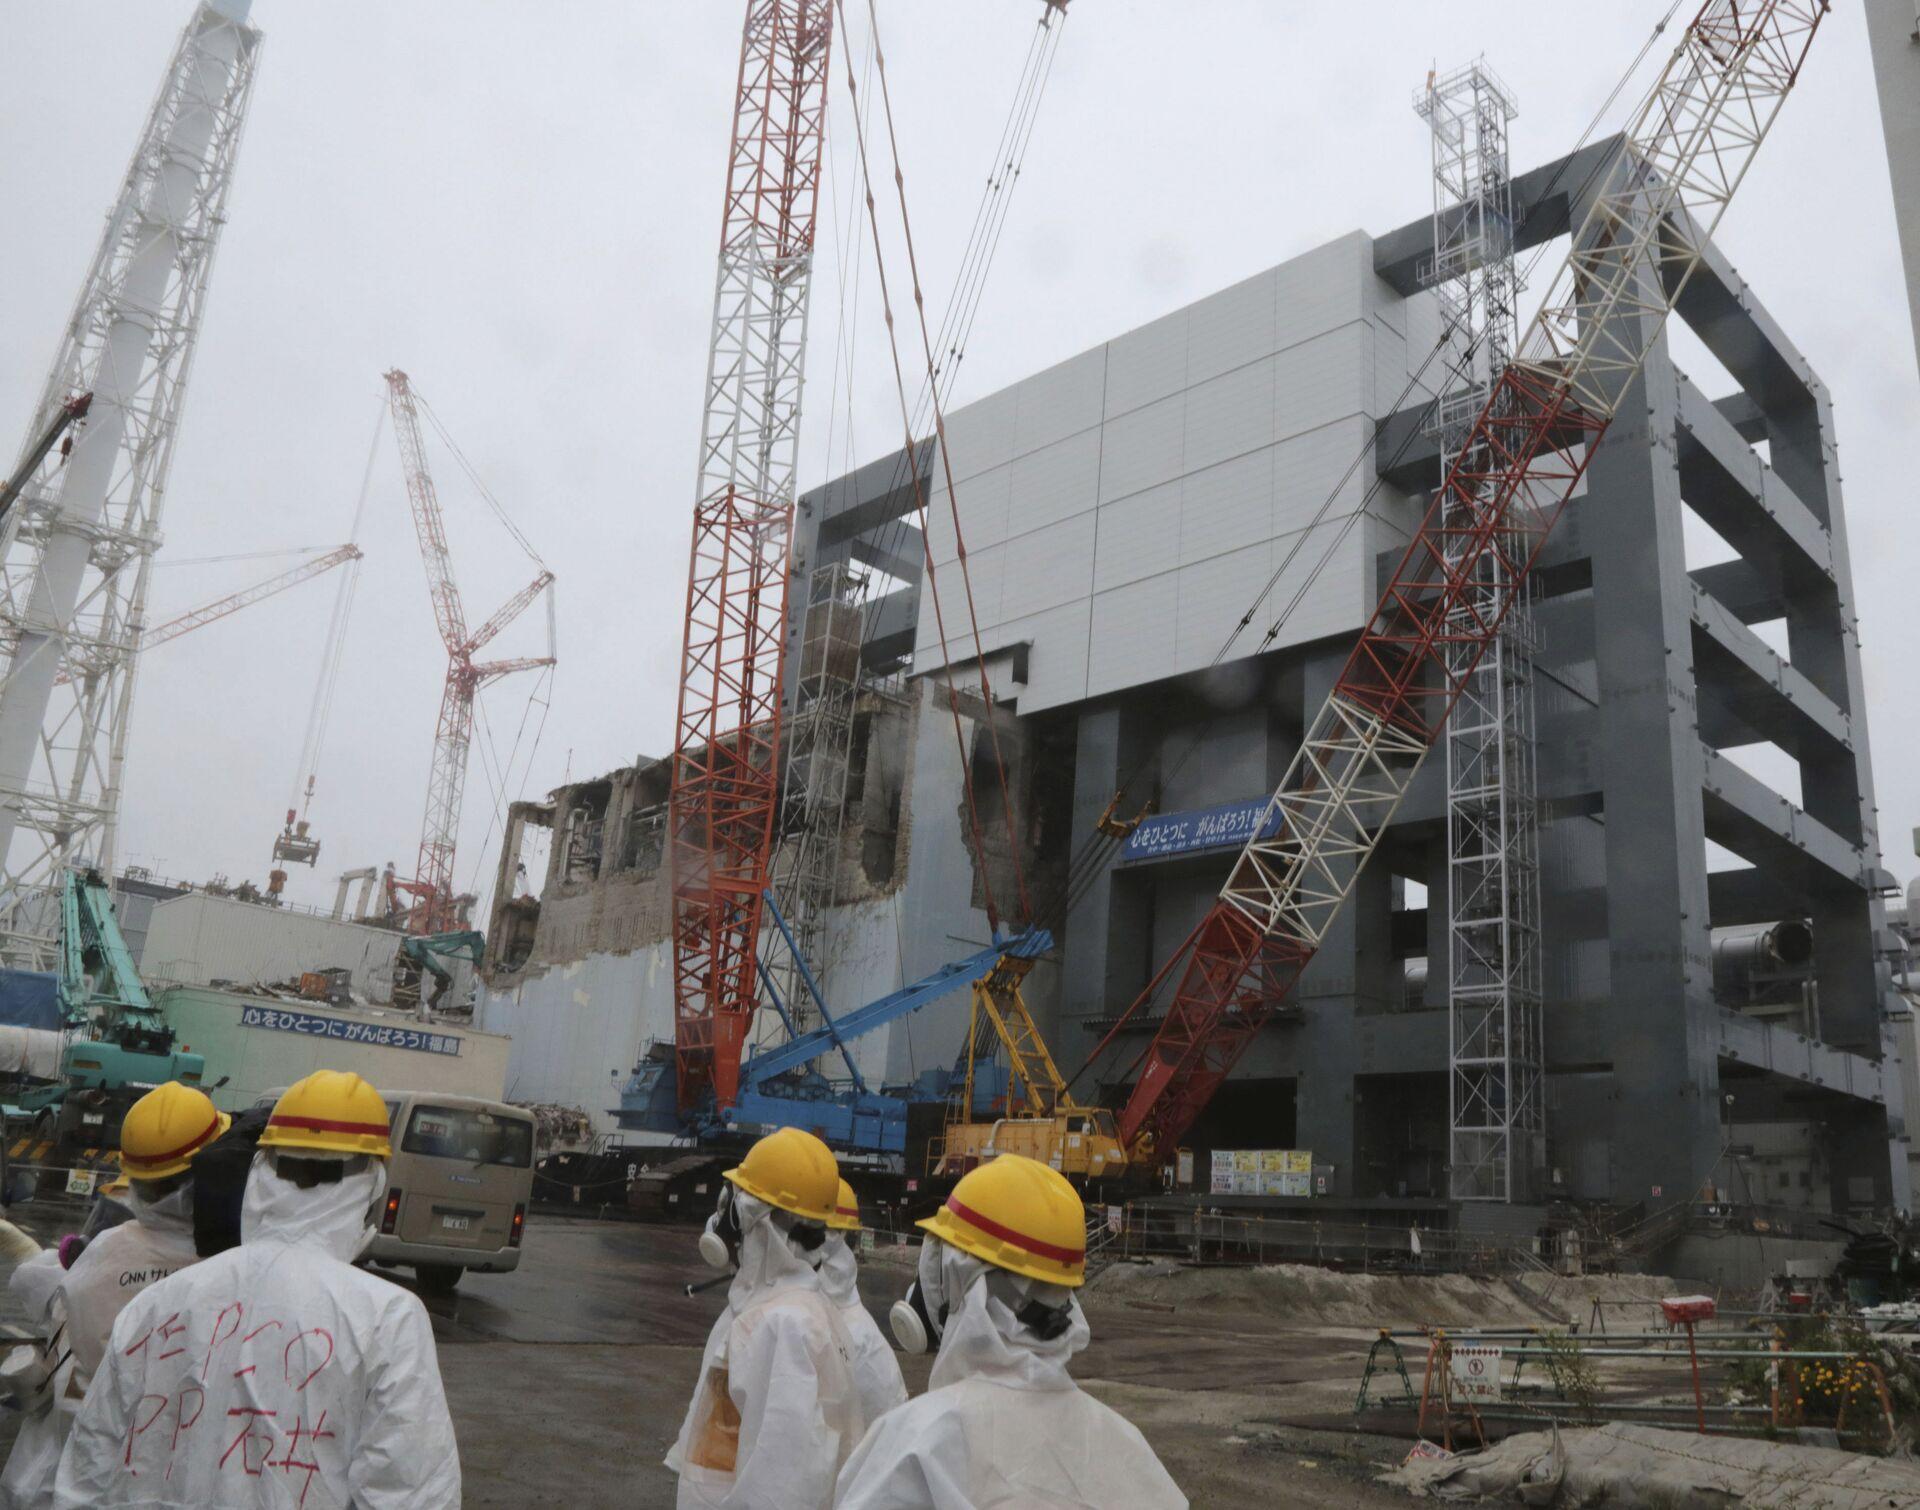 Работы по ликвидации последствий аварии на АЭС Фукусима-1 в Окуме, Япония. 12 июня 2013 - РИА Новости, 1920, 10.03.2021